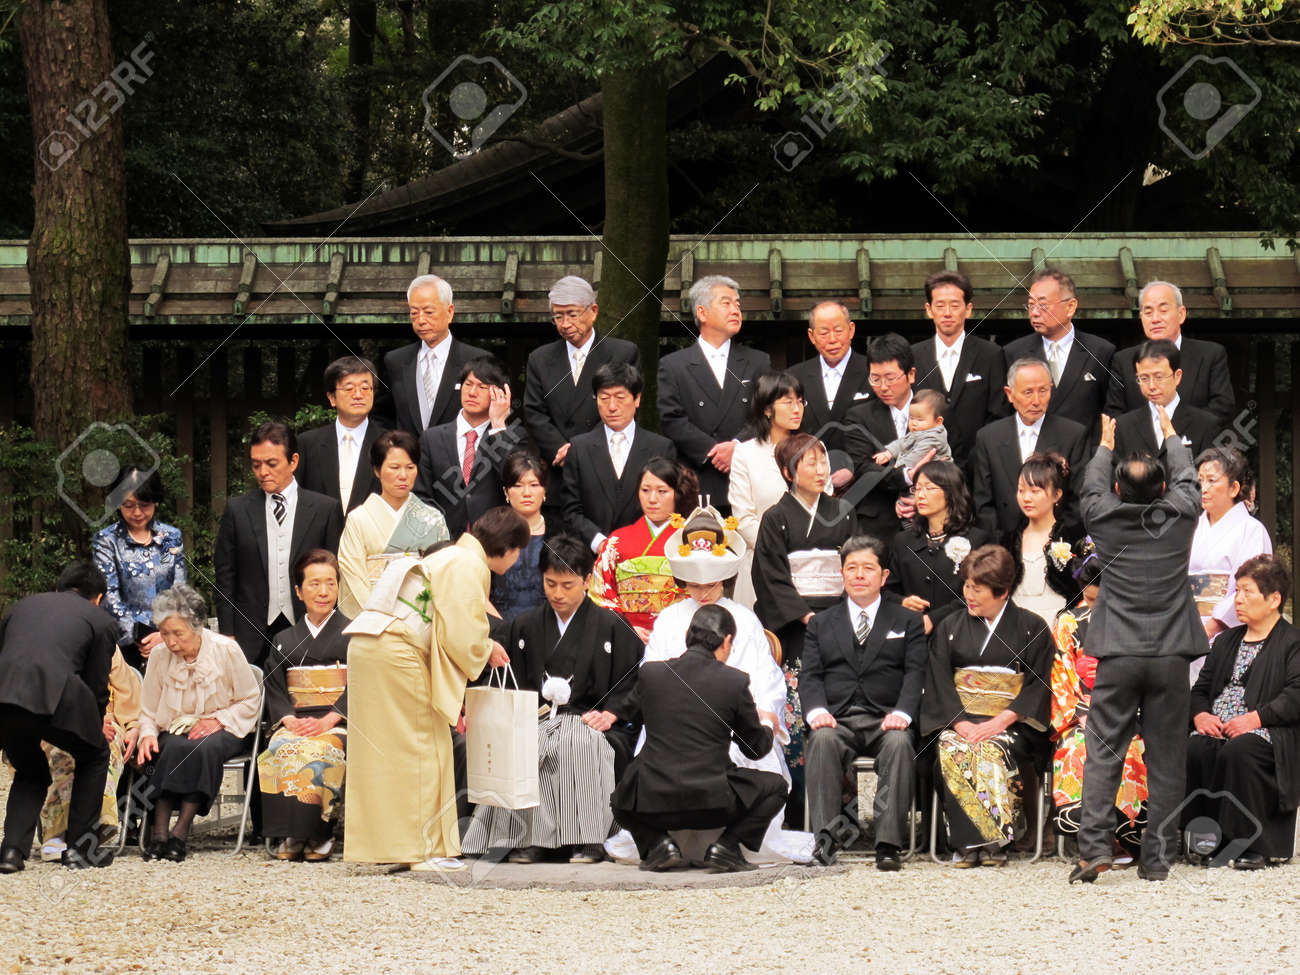 HARAJUKU,TOKYO - MARCH 25, 2012: Celebration of a typical wedding ceremony in Meiji Jingu Shrine Harajuku Tokyo, Japan. Stock Photo - 17262297